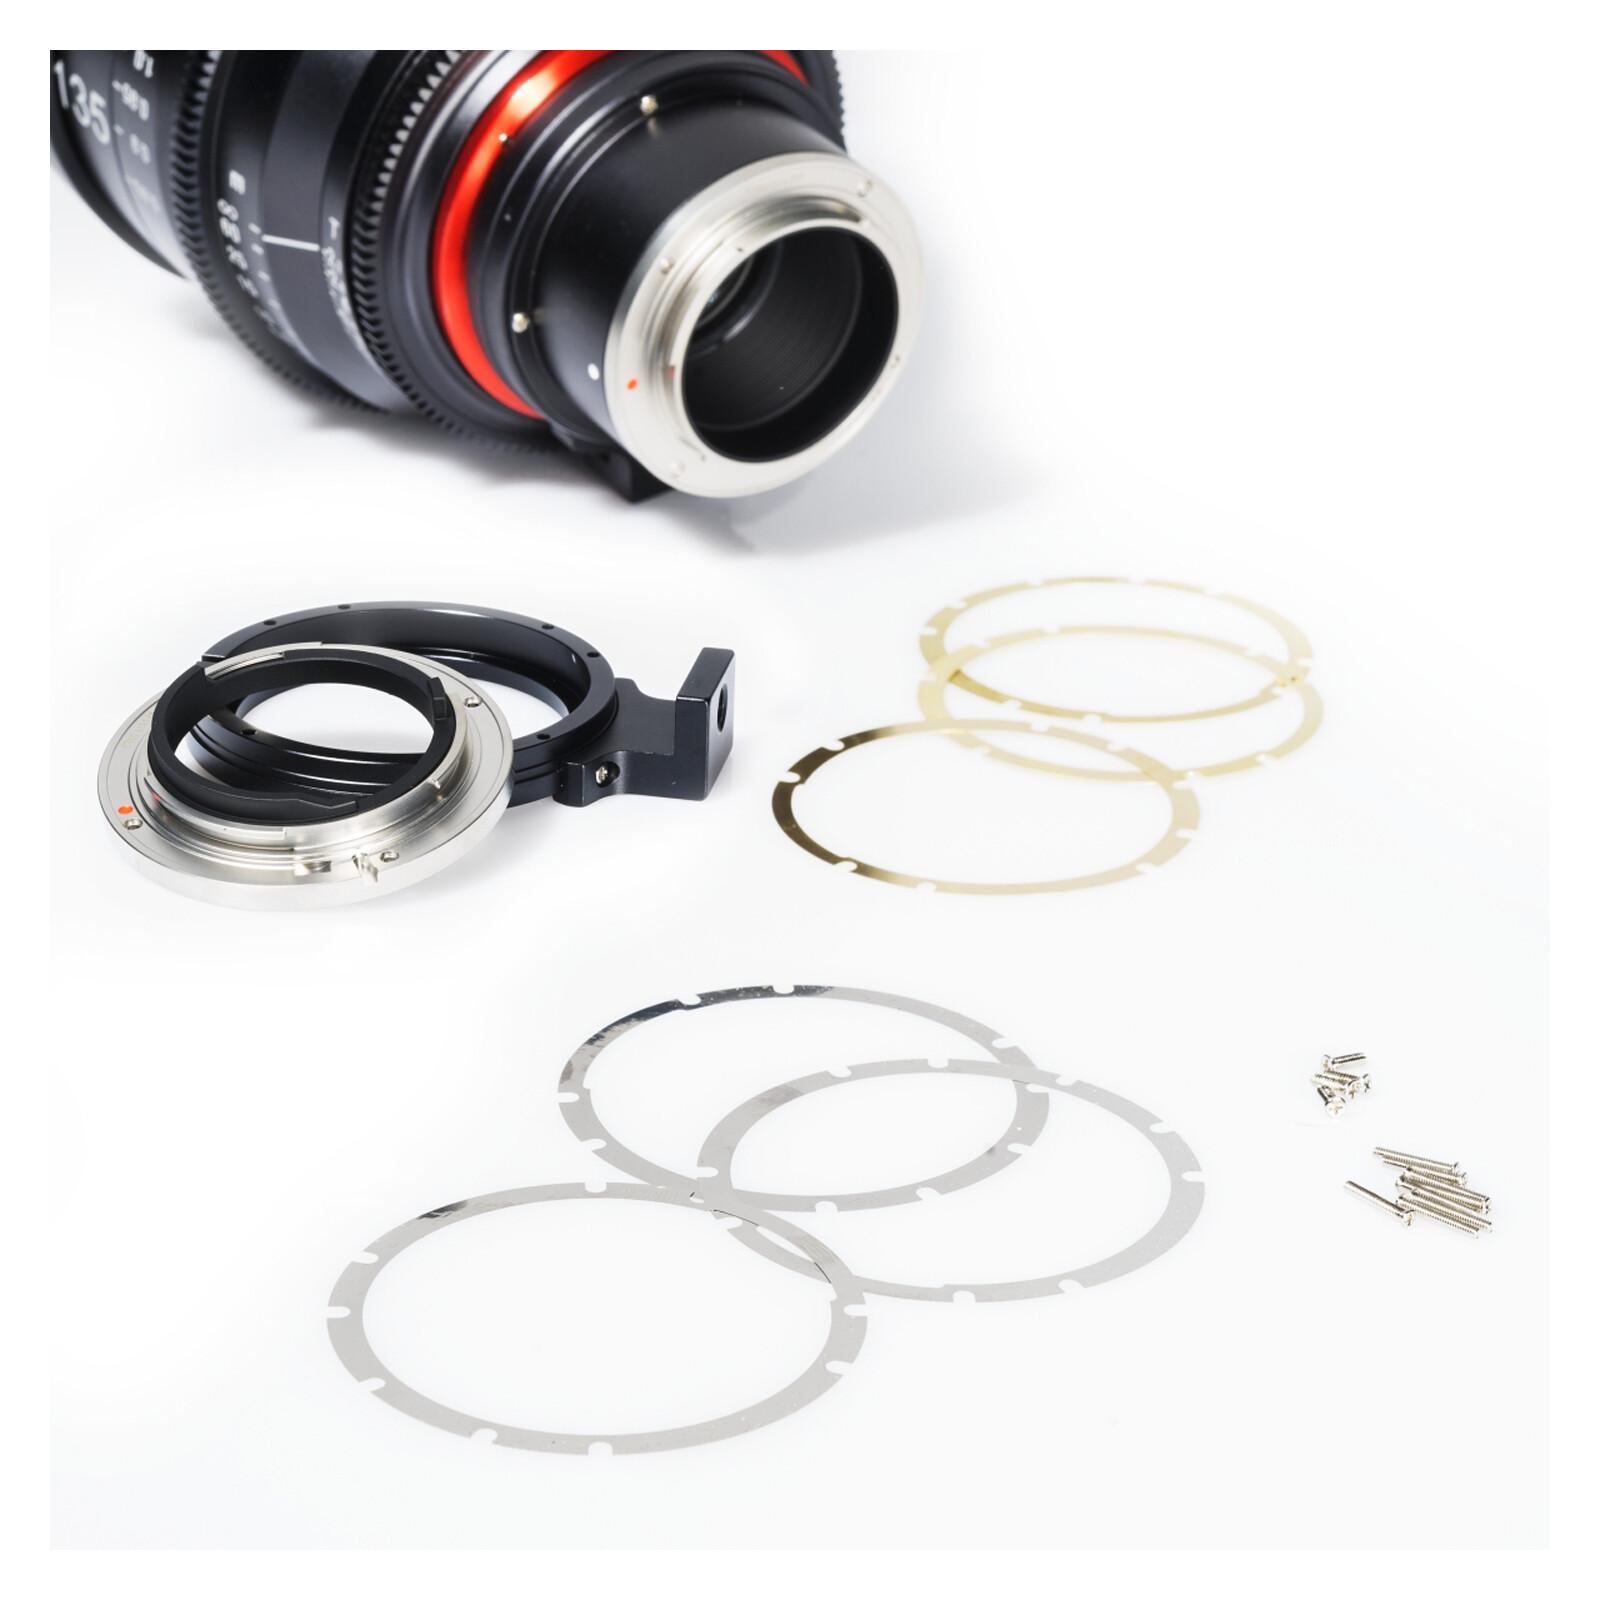 XEEN Mount Kit Nikon F 14mm